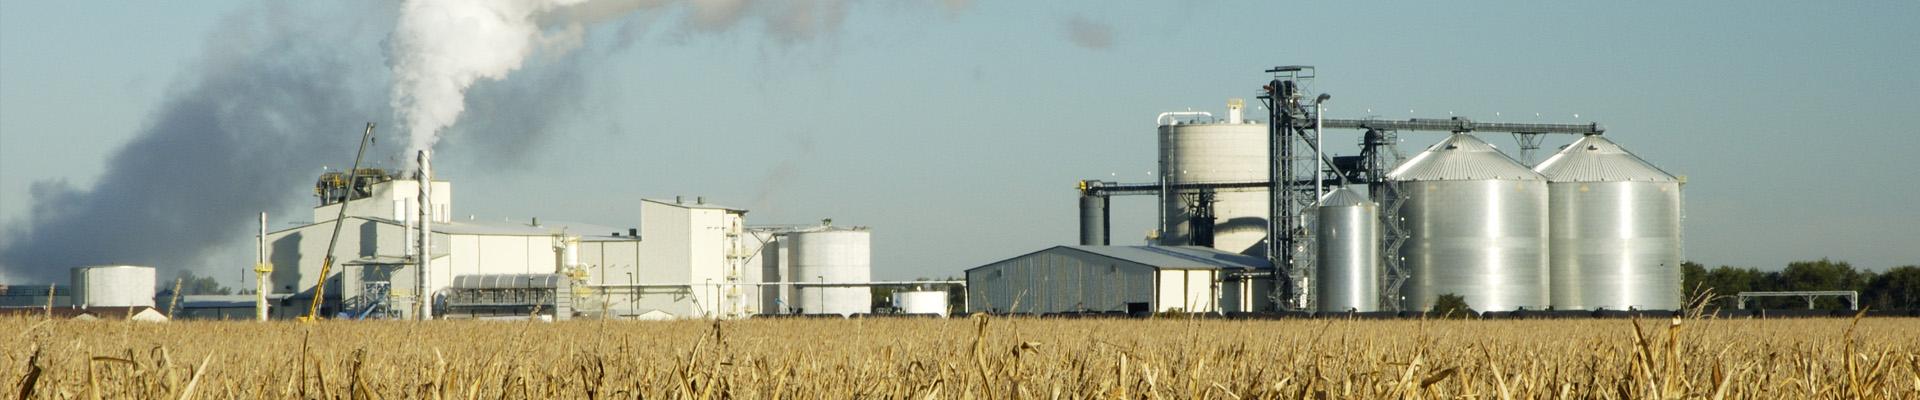 Ethanol Industry - Distillers Grains